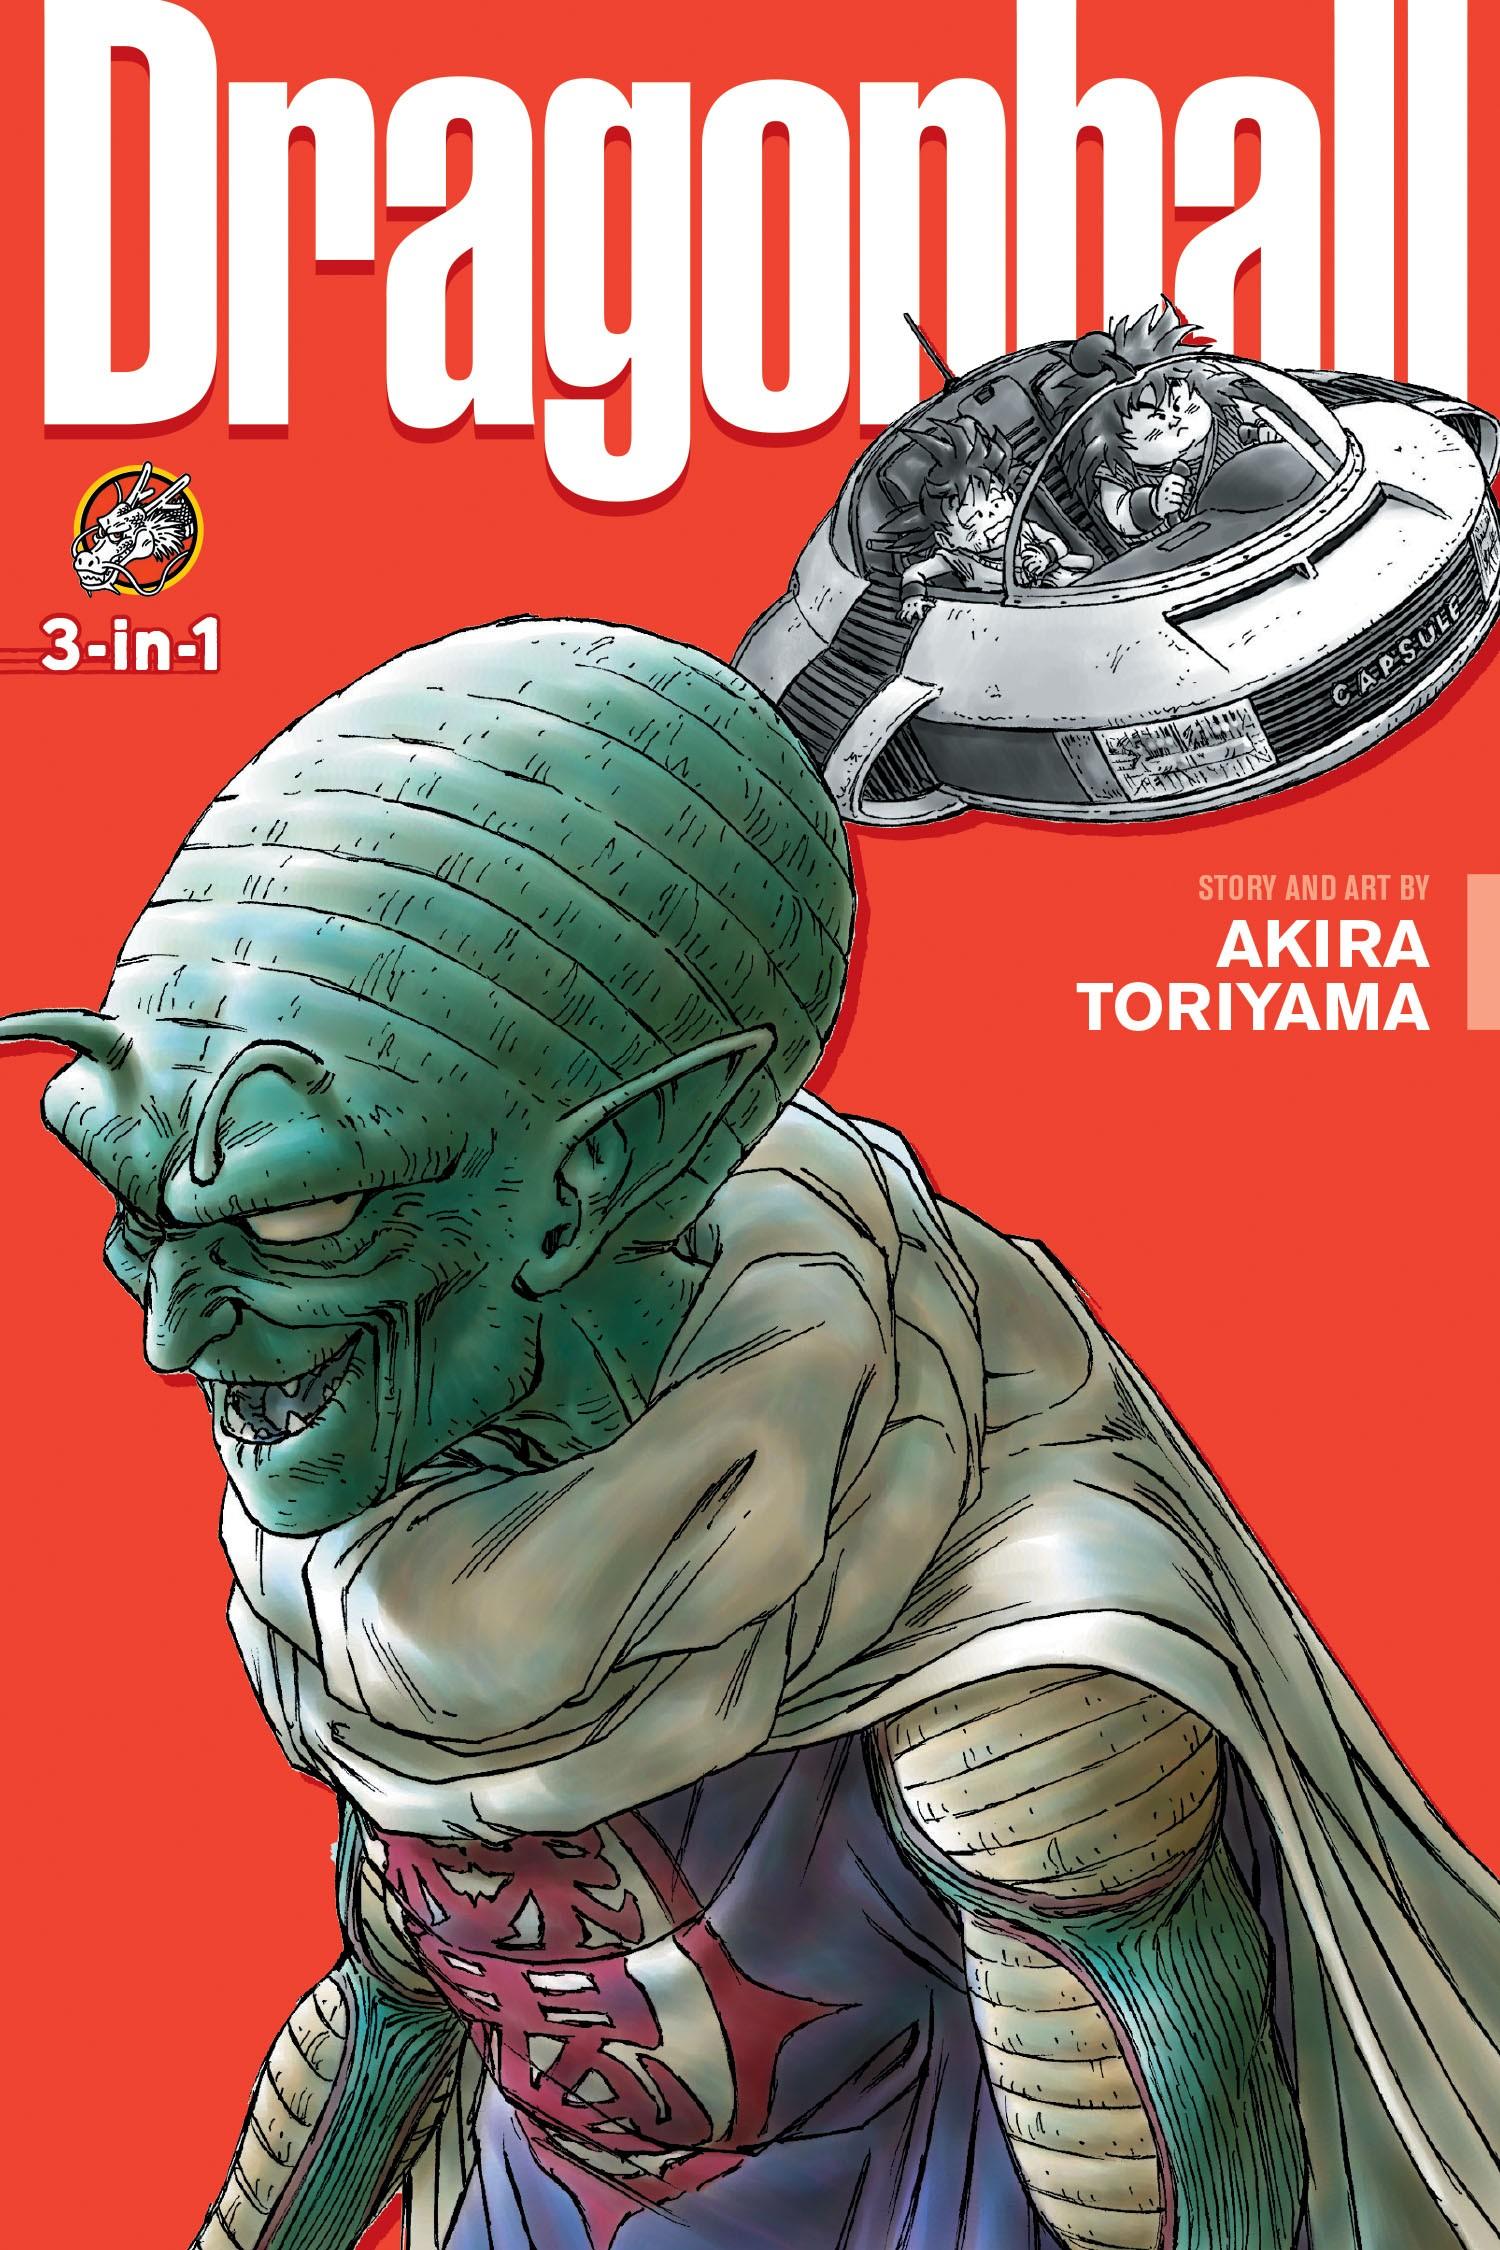 Dragon Ball (3-in-1 Edition), Vol. 04 by Akira Toriyama